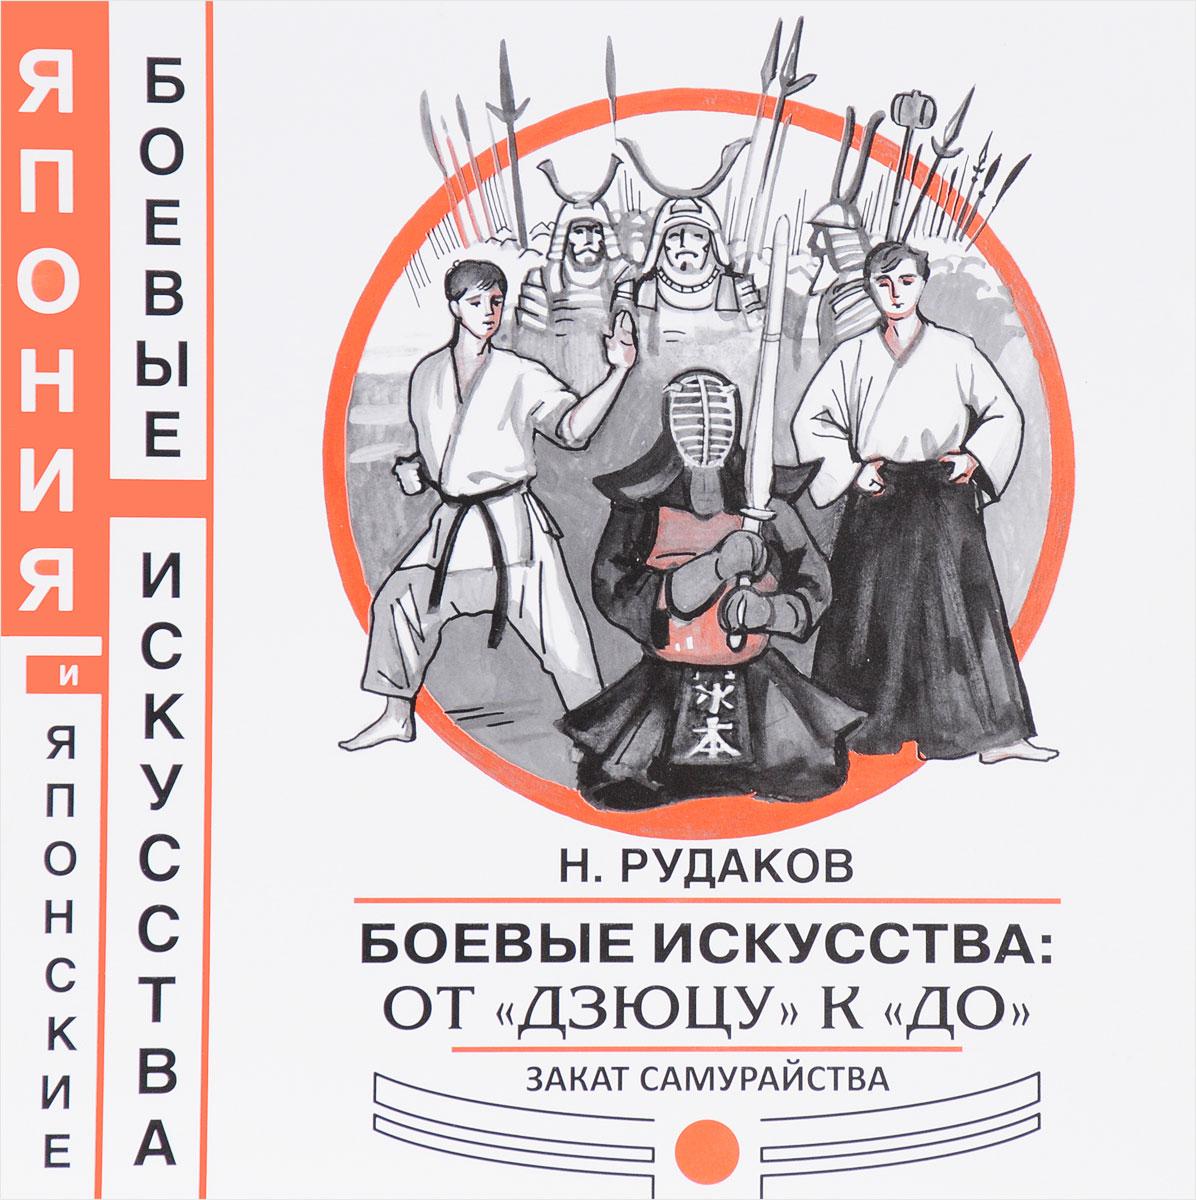 Н. Рудаков Боевые искусства. От Дзюцу к До. Закат самурайства